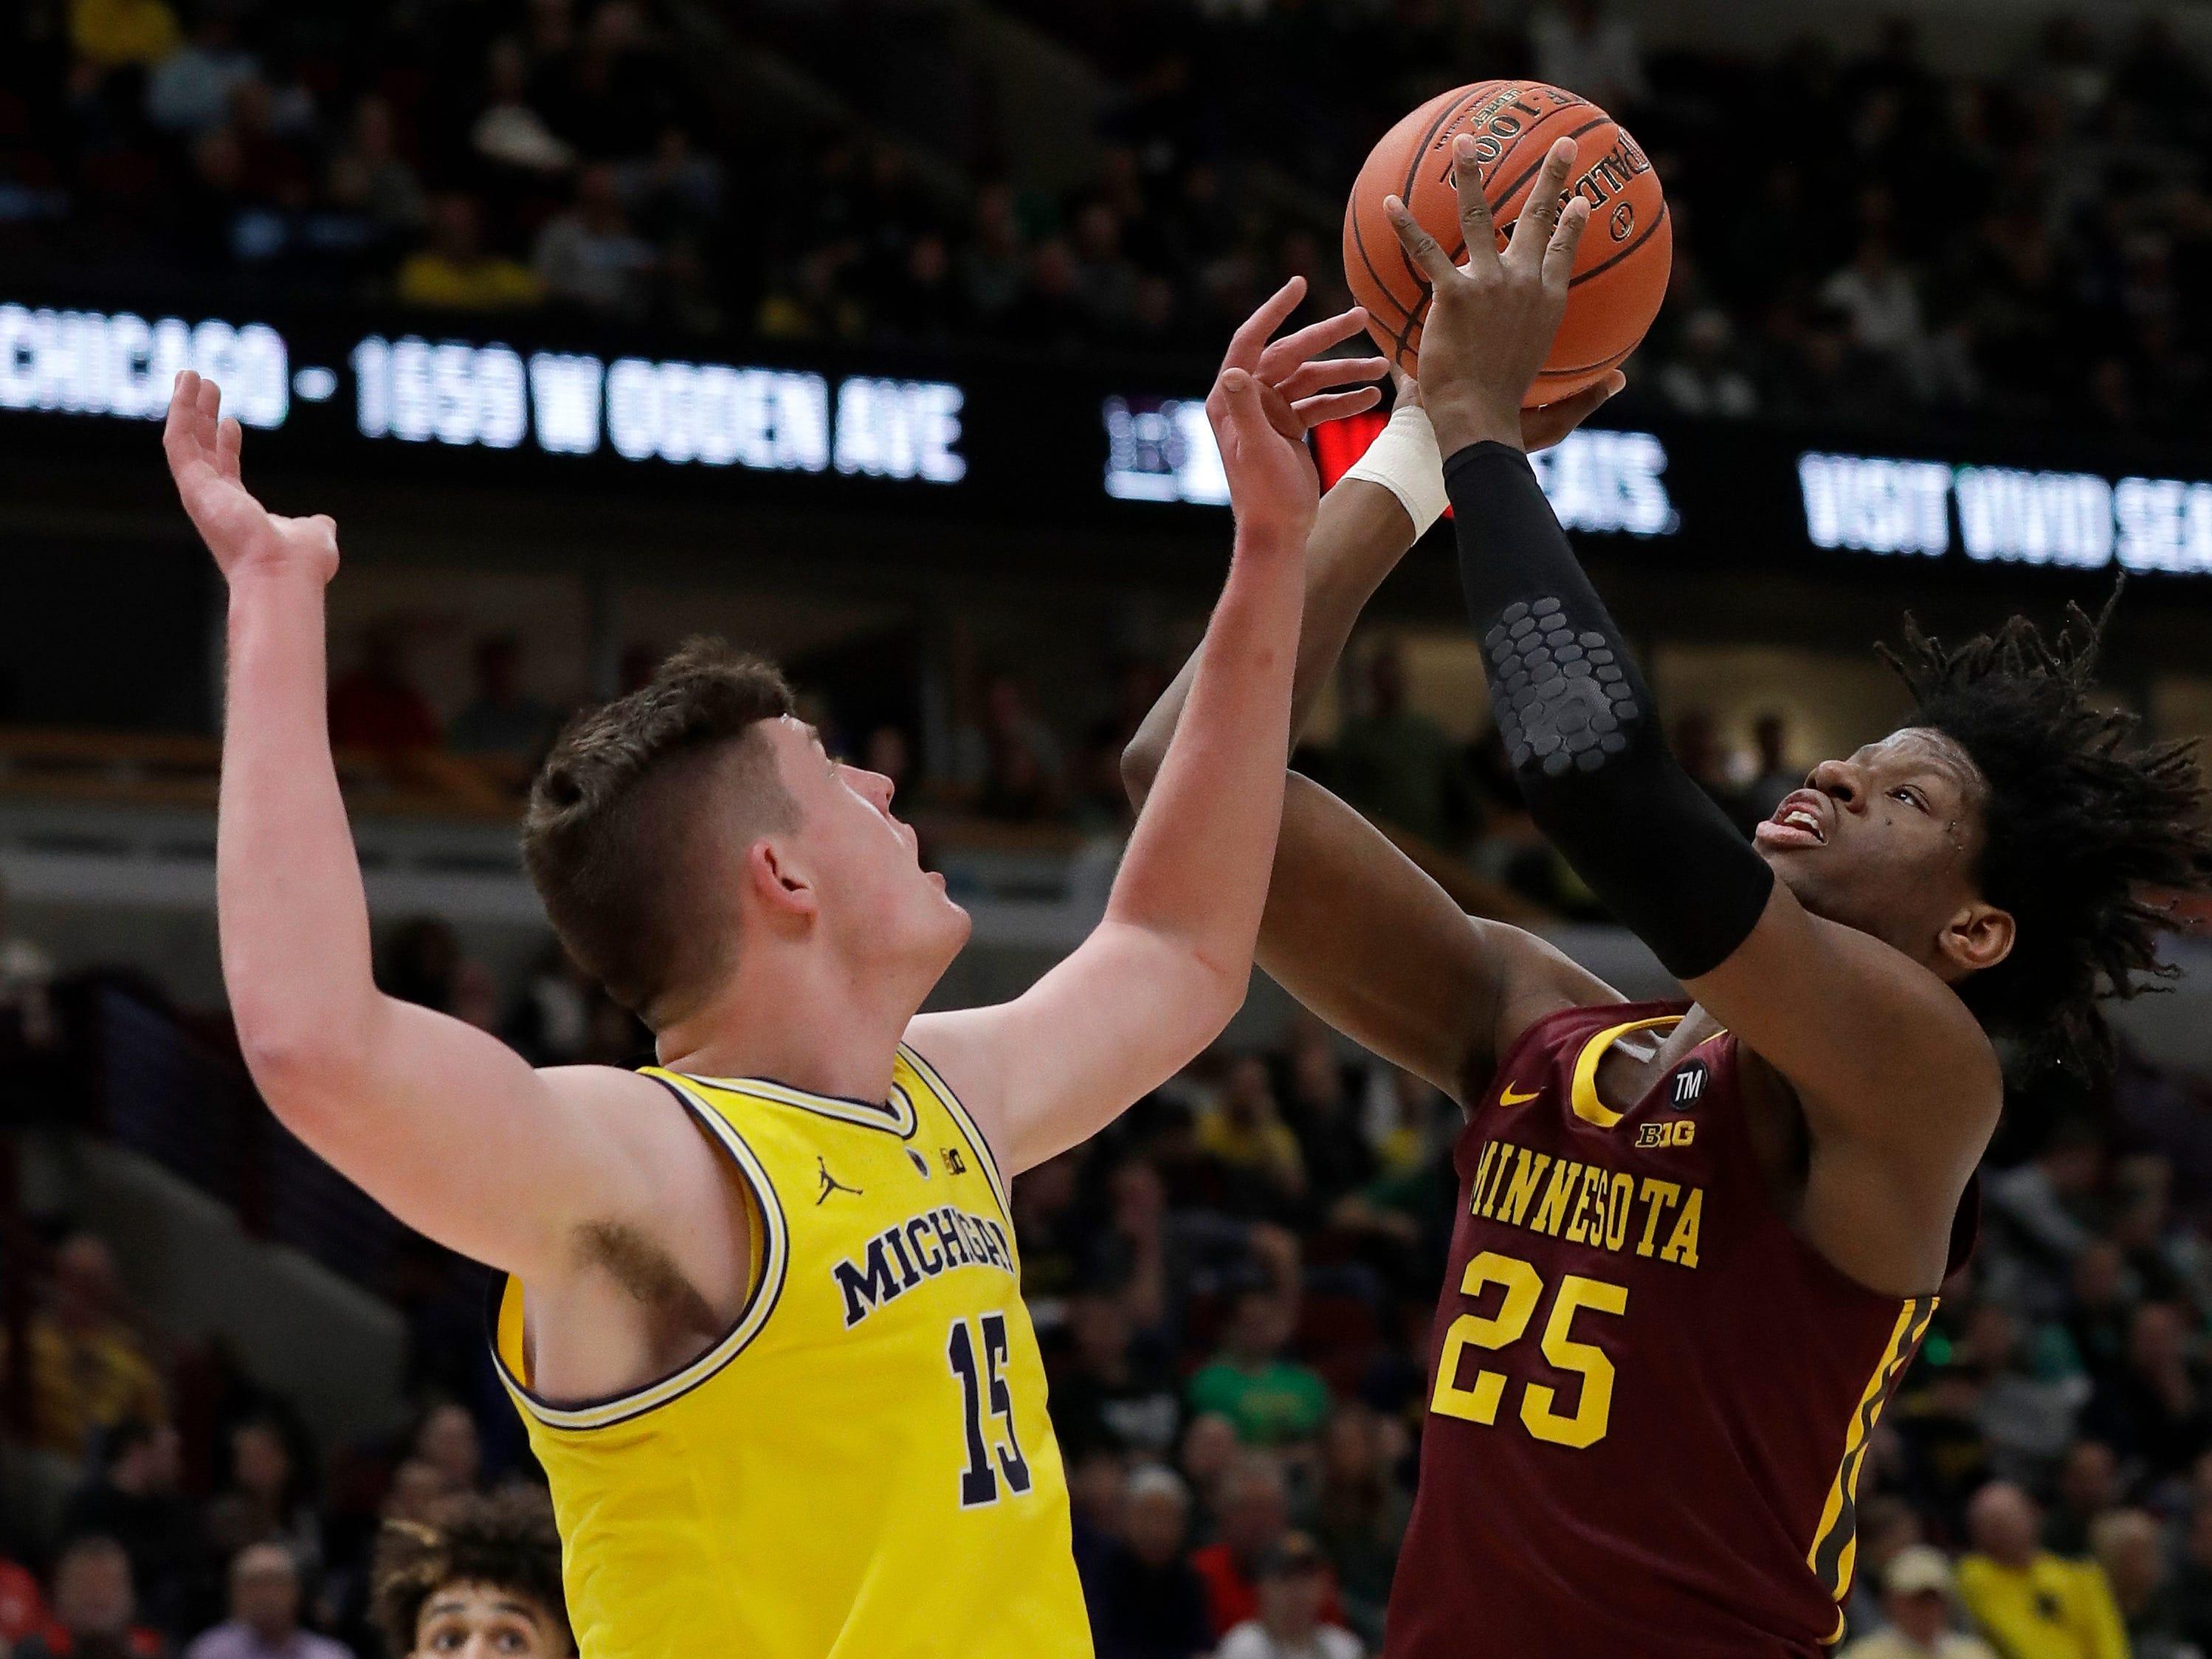 Michigan's Jon Teske blocks a shot by Minnesota's Daniel Oturu during the first half of the semifinals of the Big Ten tournament.